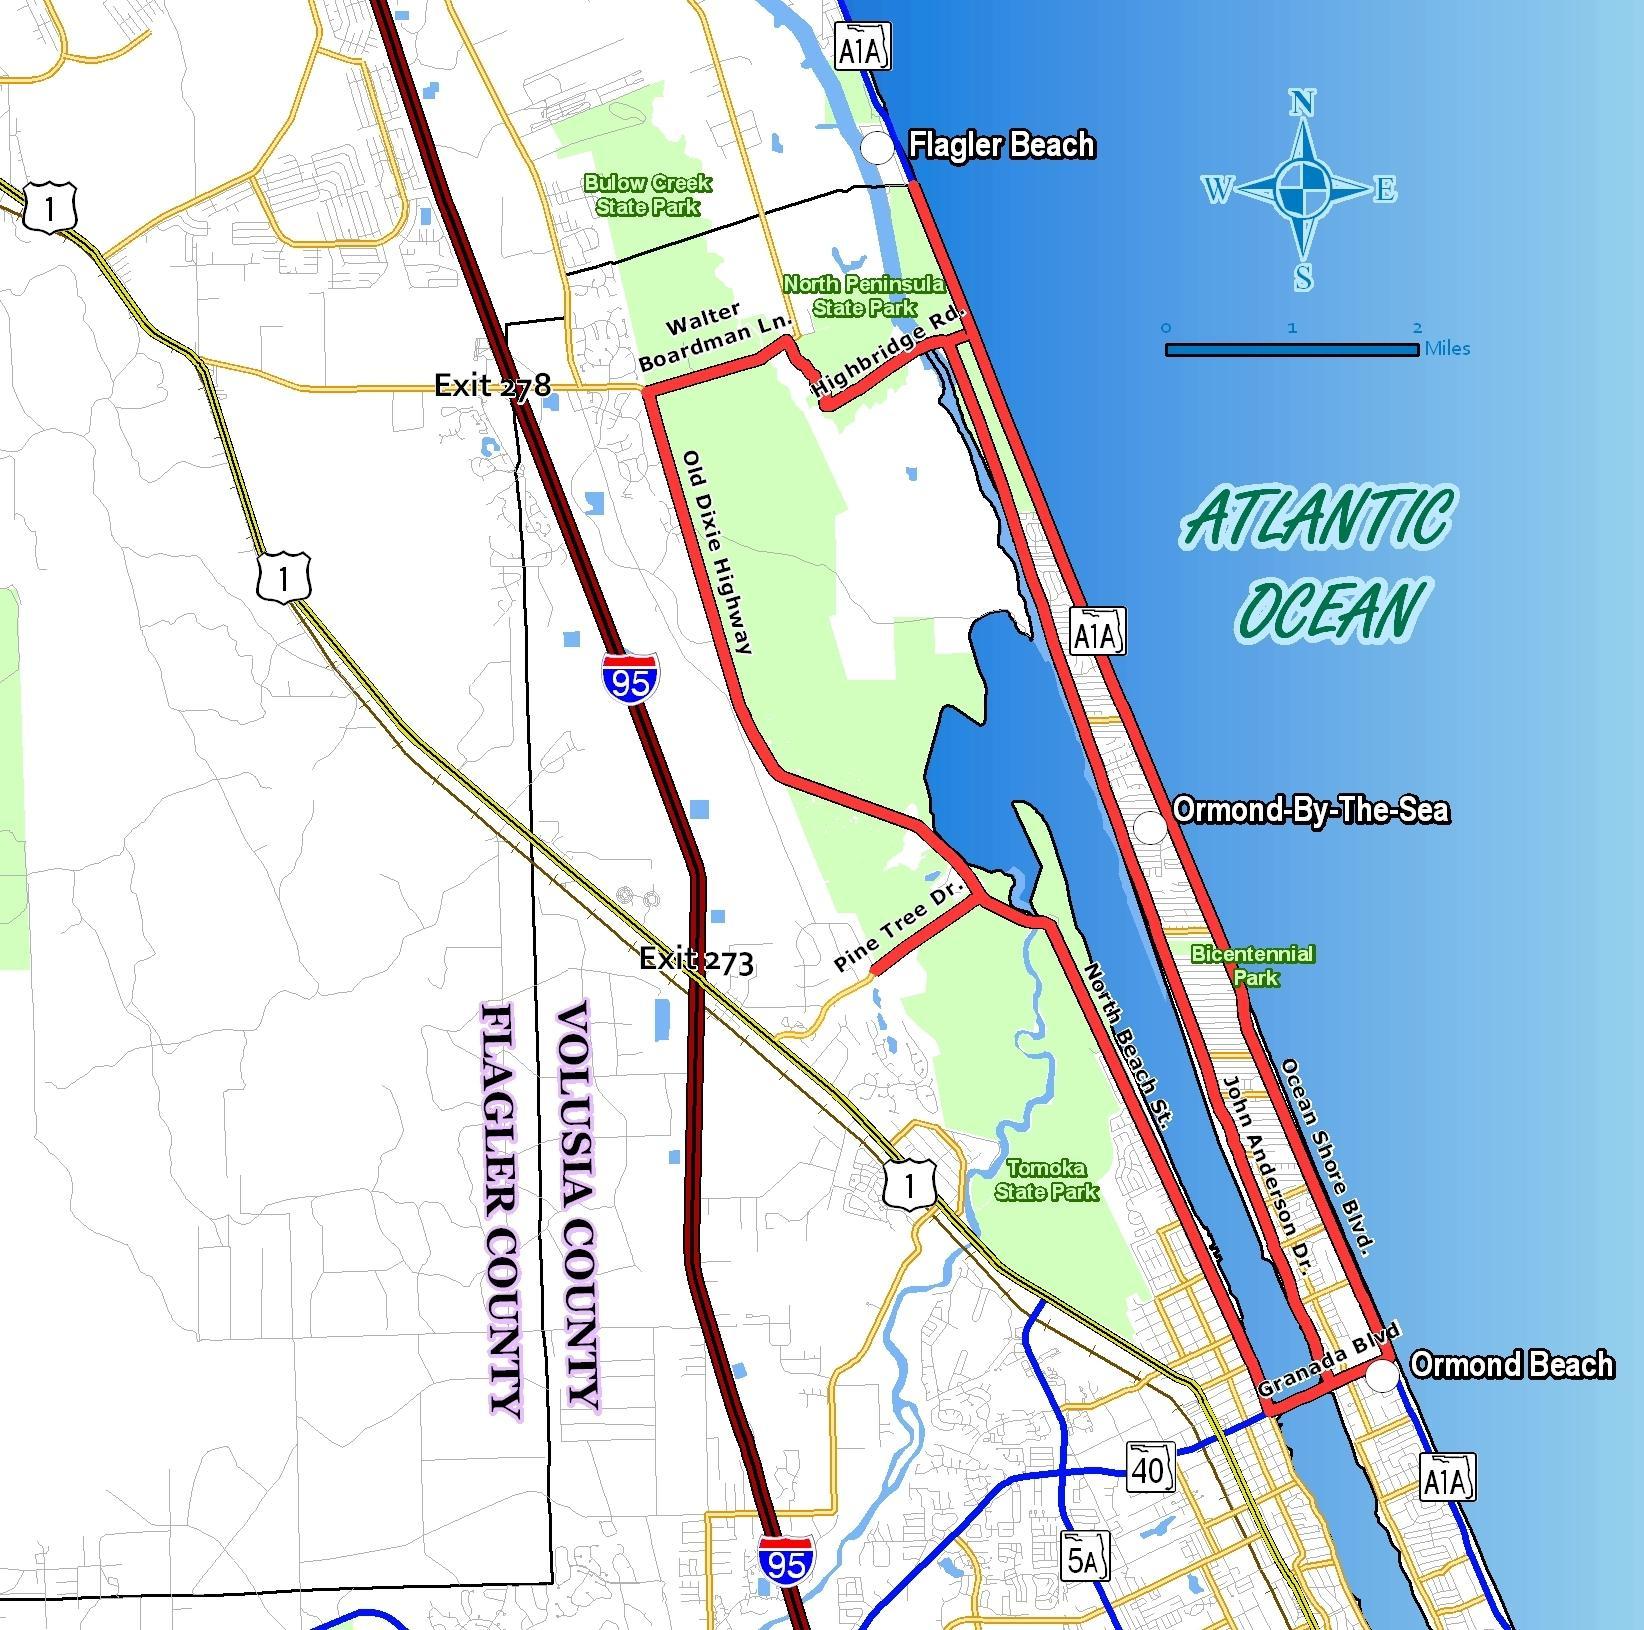 Oslt_Home - New Smyrna Beach Florida Map